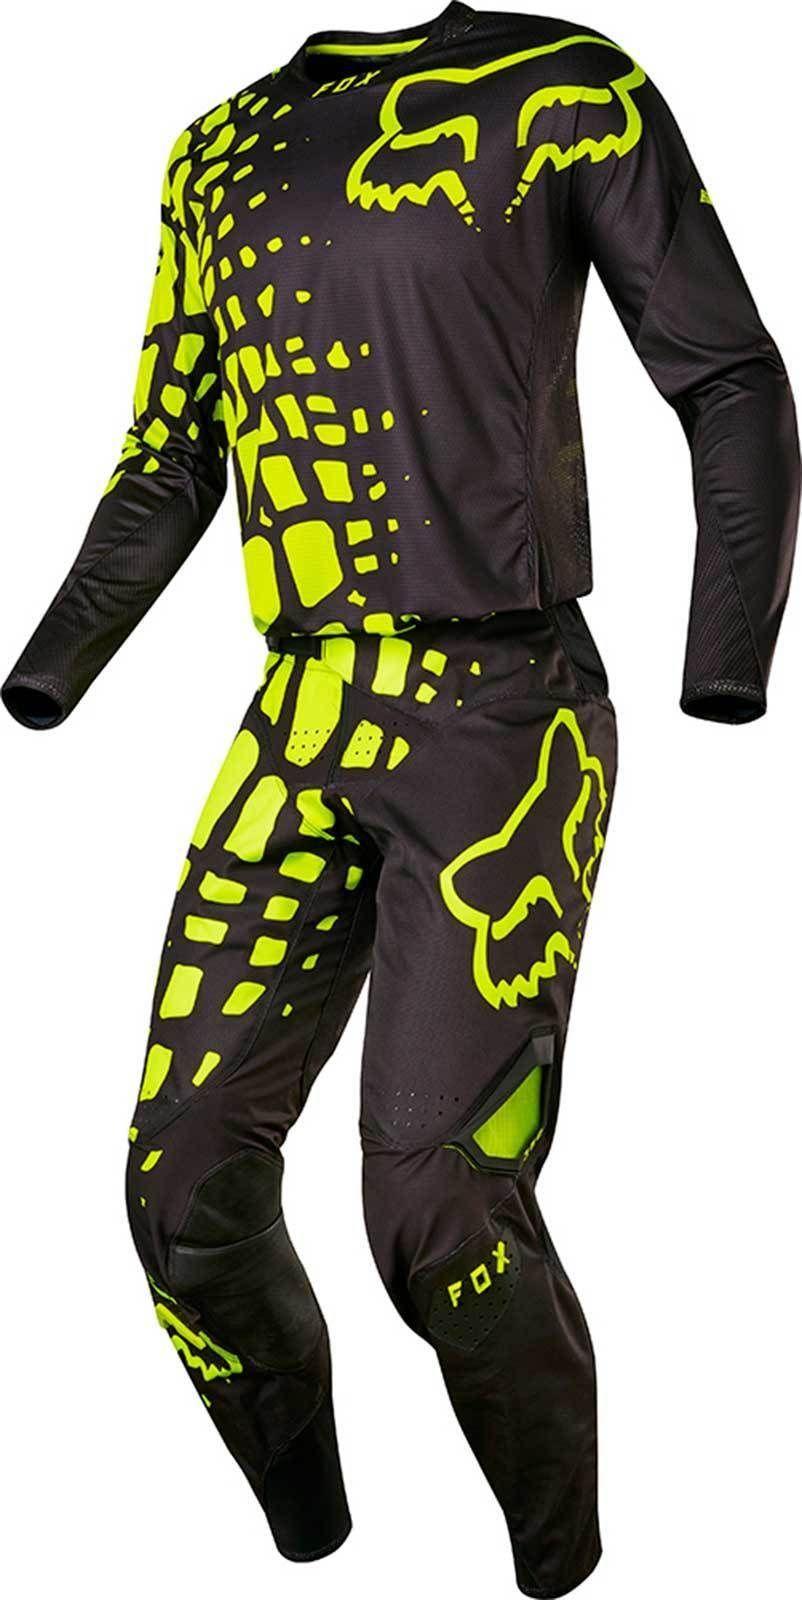 6baf7855979634 2017 Fox Racing 360 Grav Combo - Motocross Mx Atv Dirt Bike Gear Jersey Pant